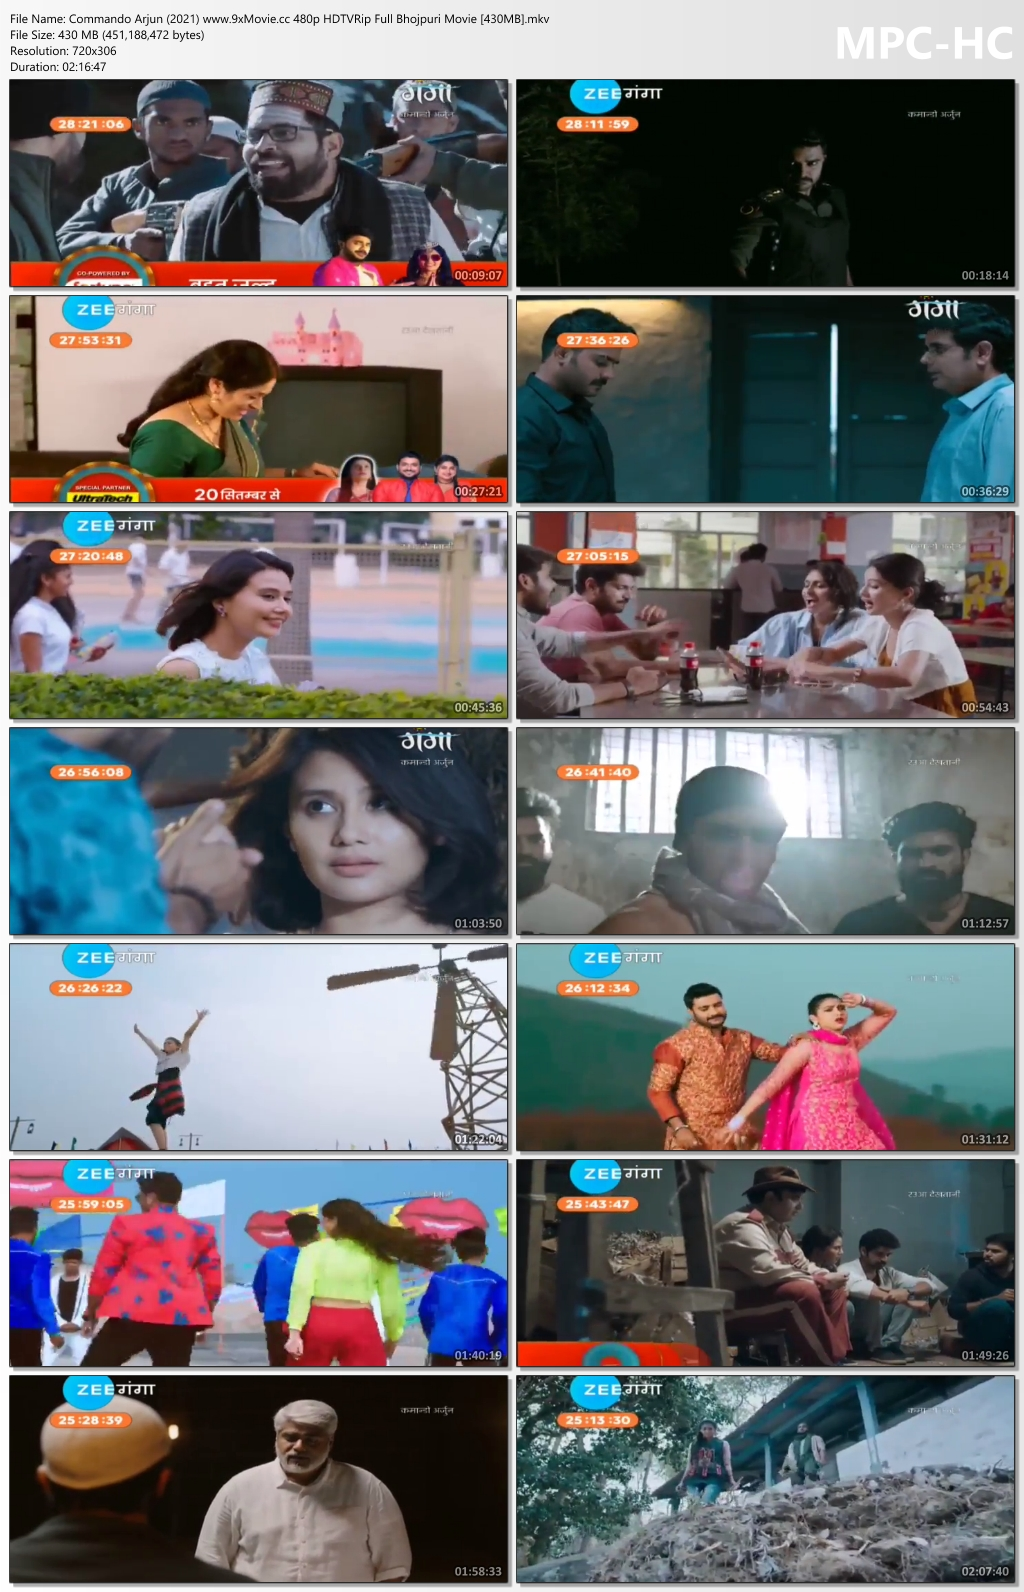 Commando-Arjun-2021-www-9x-Movie-cc-480p-HDTVRip-Full-Bhojpuri-Movie-430-MB-mkv